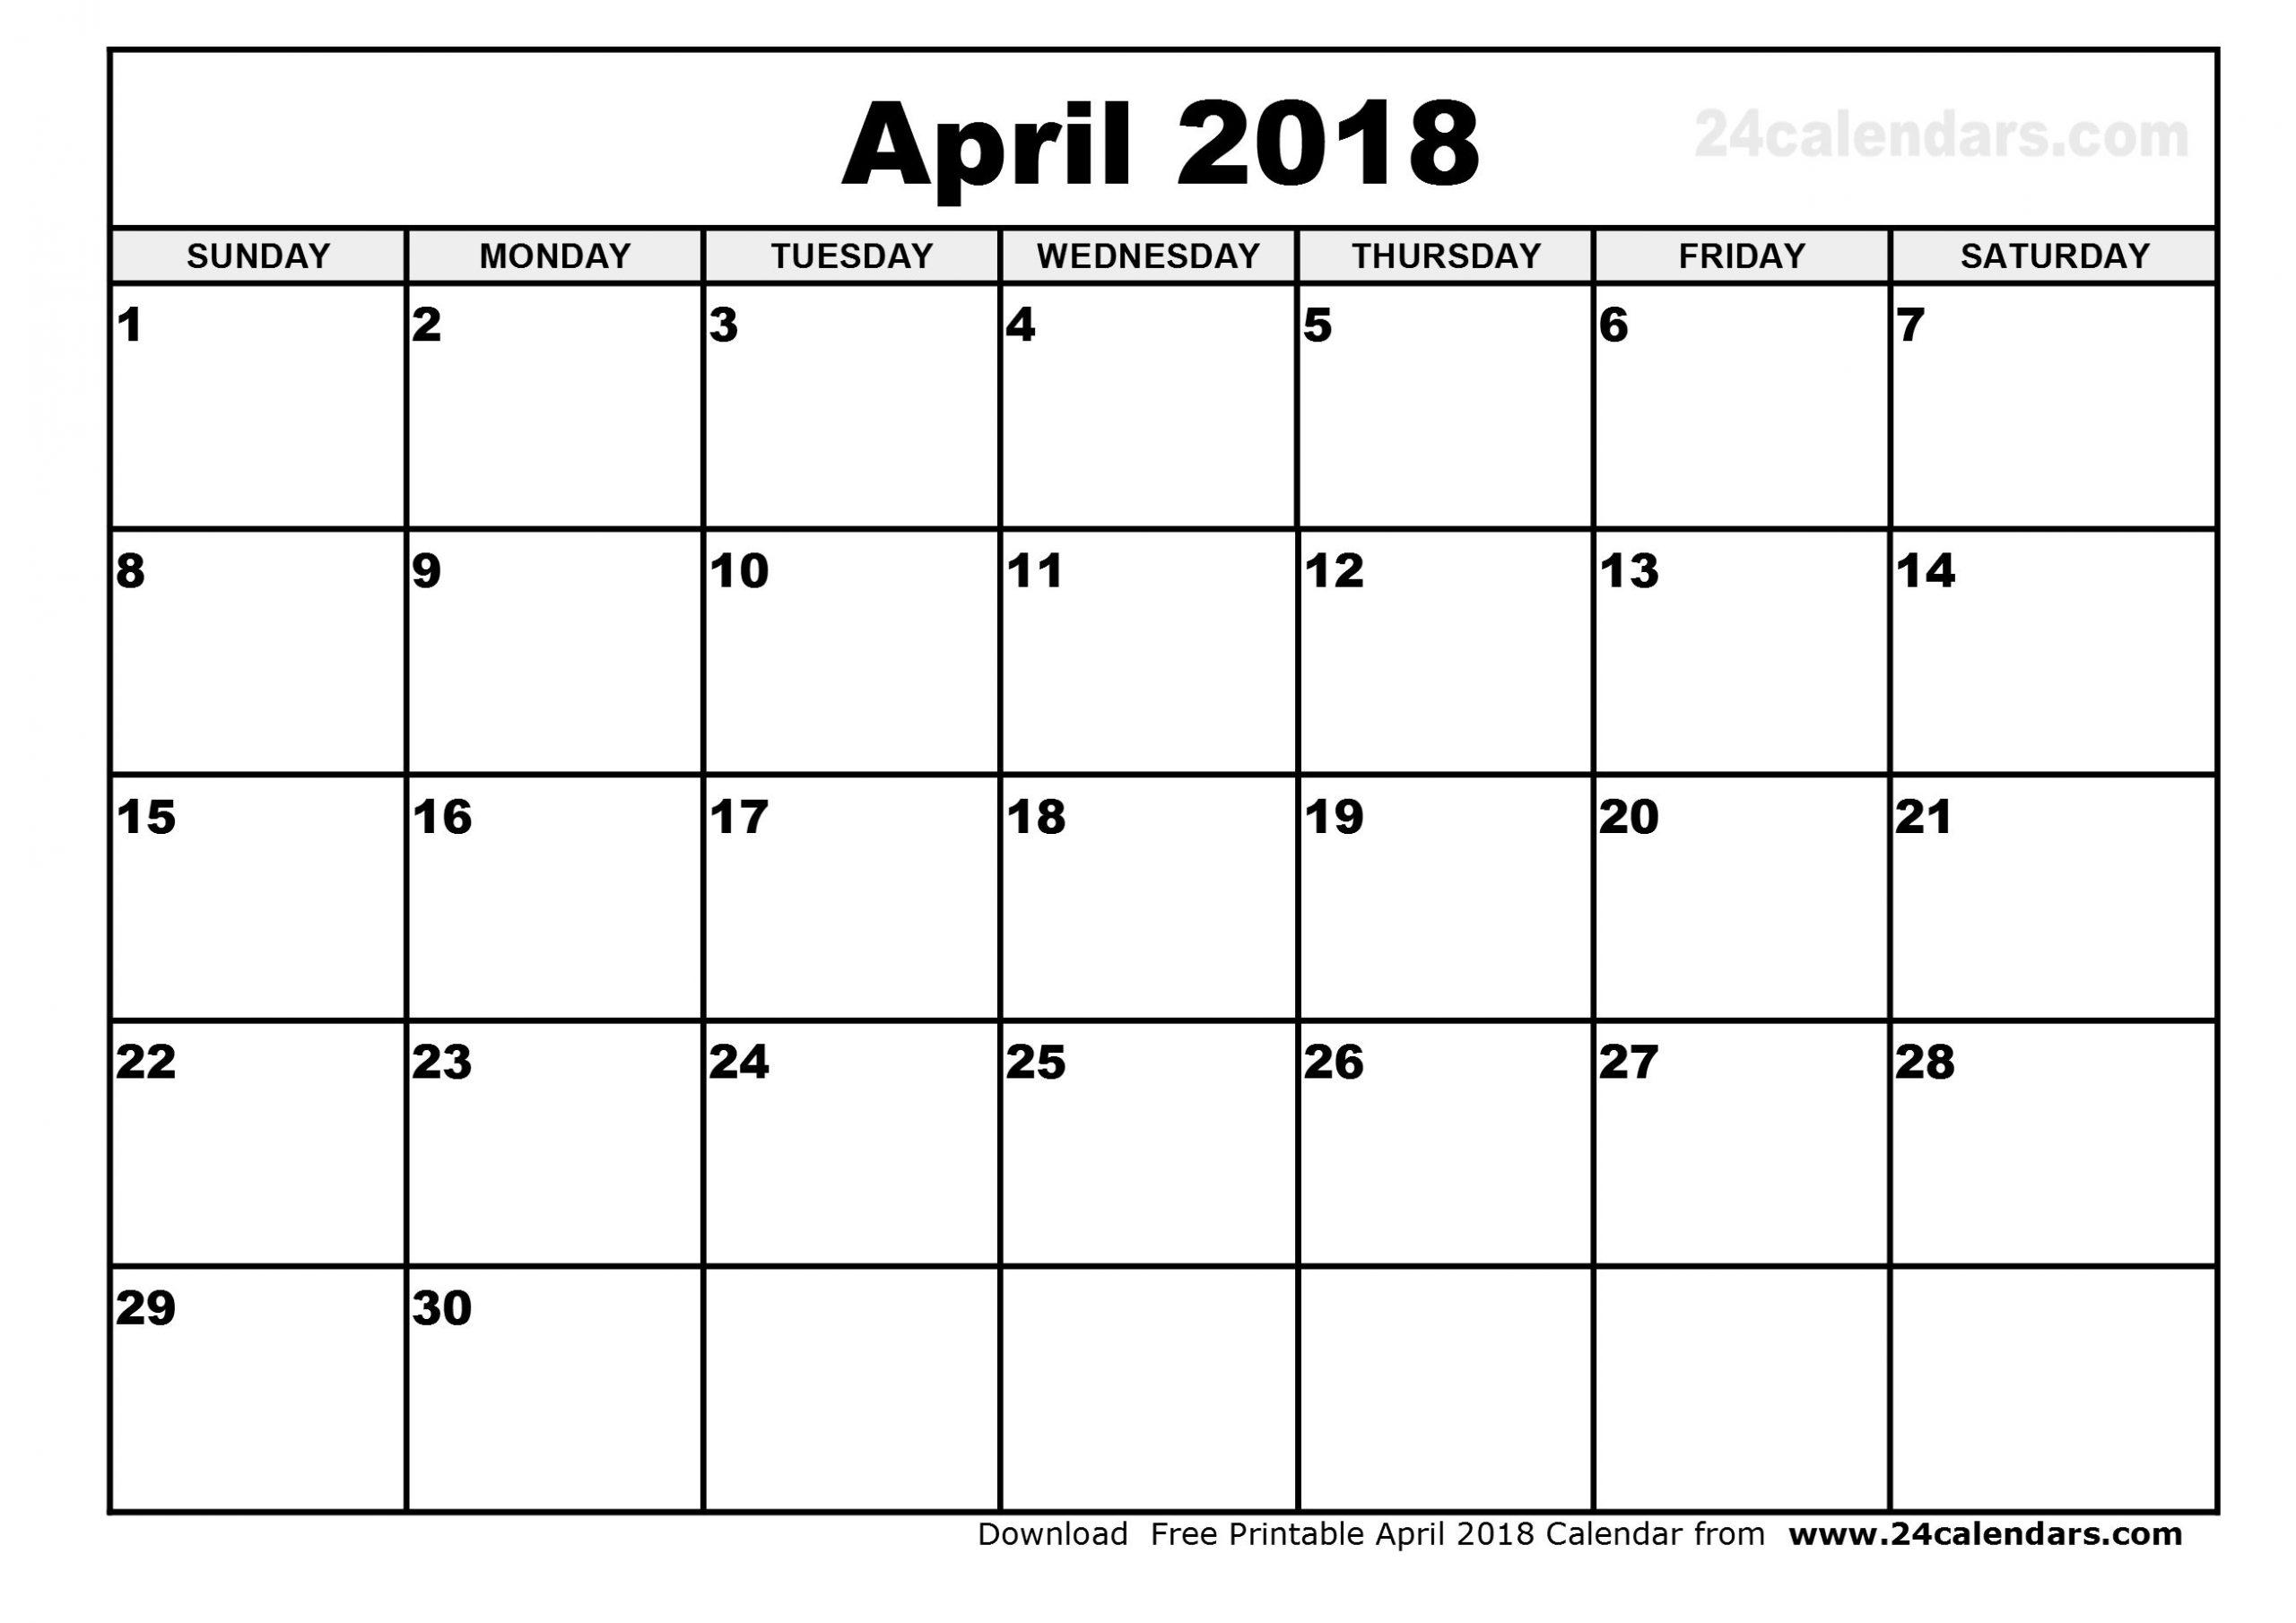 April 2018 Calendar Vertex | Qualads